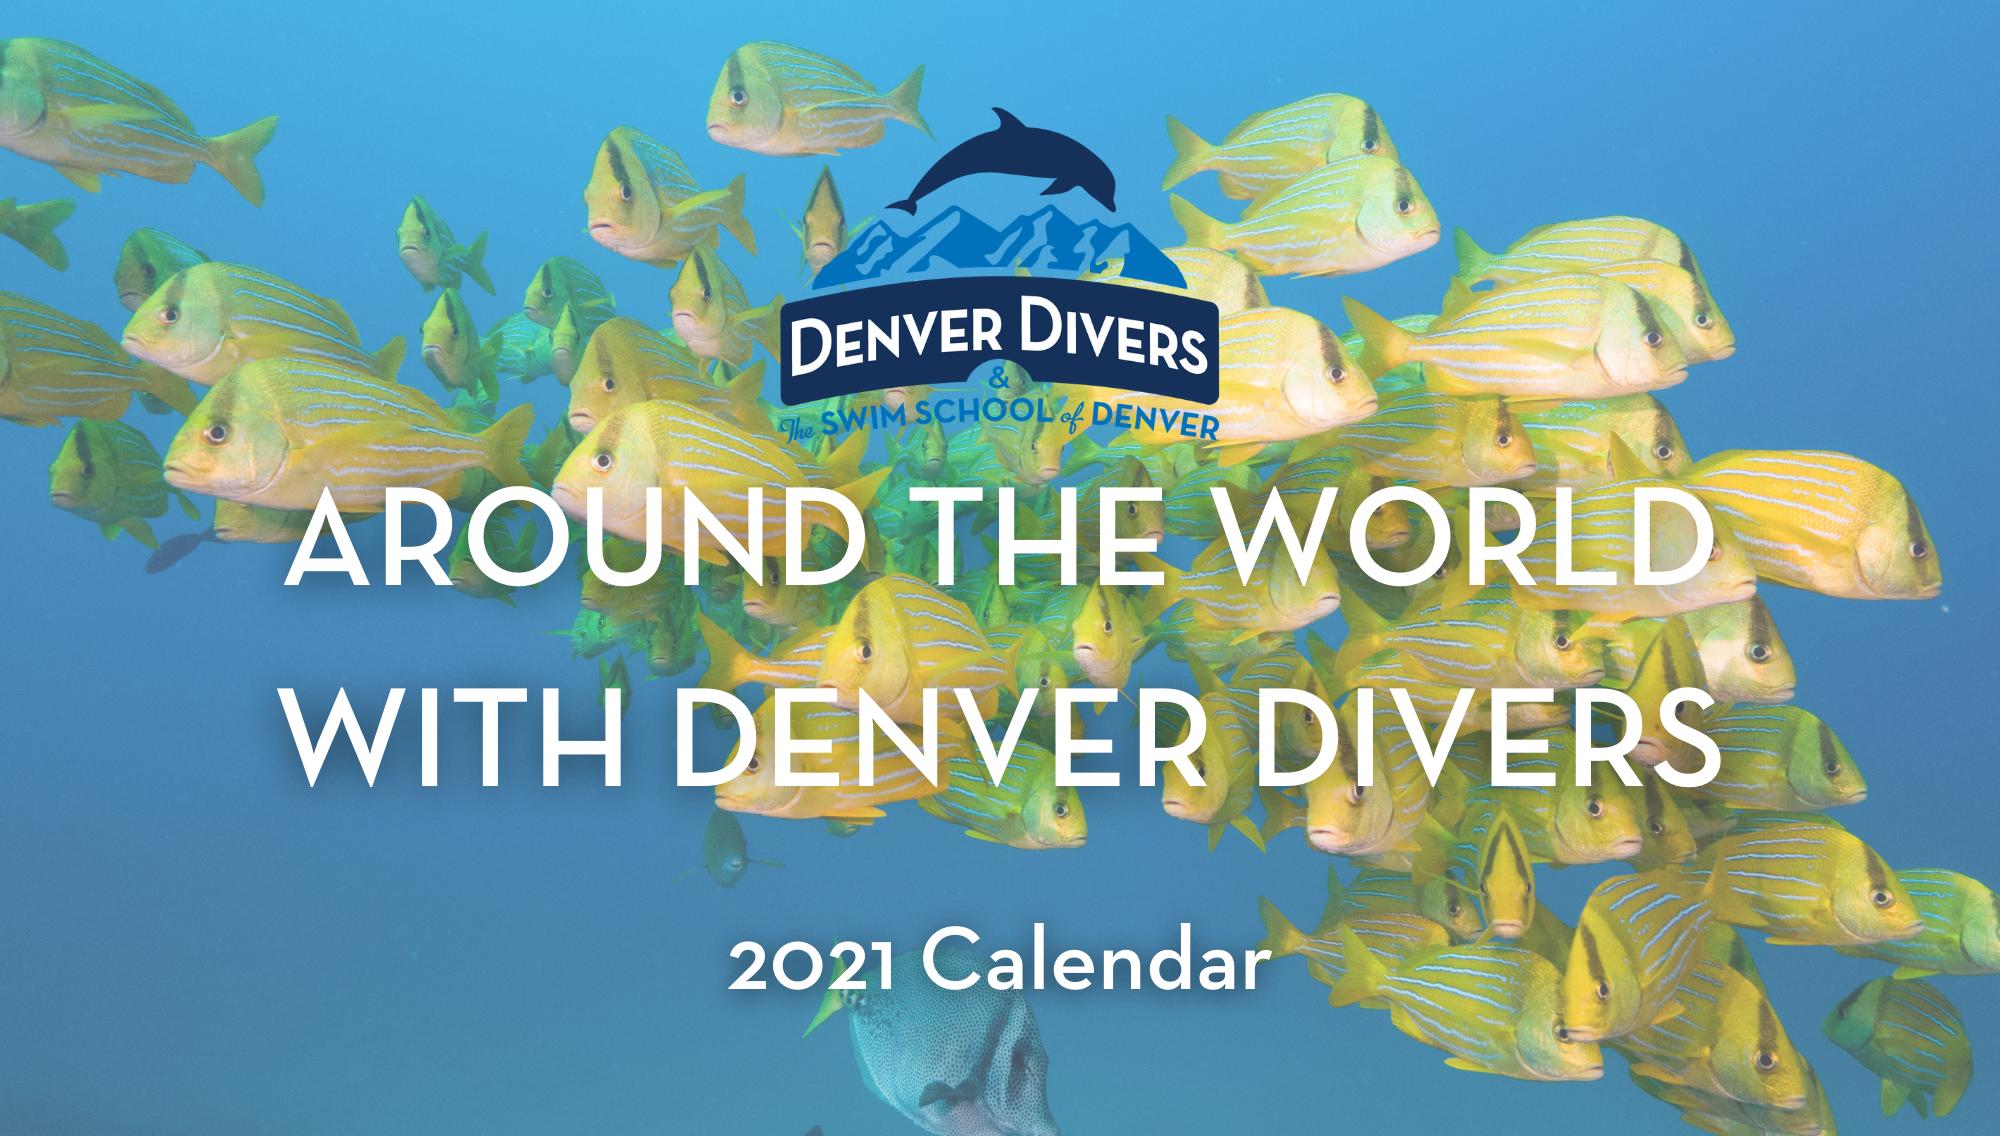 DENVER DIVERS Underwater Photography 2021 Desk Calendar